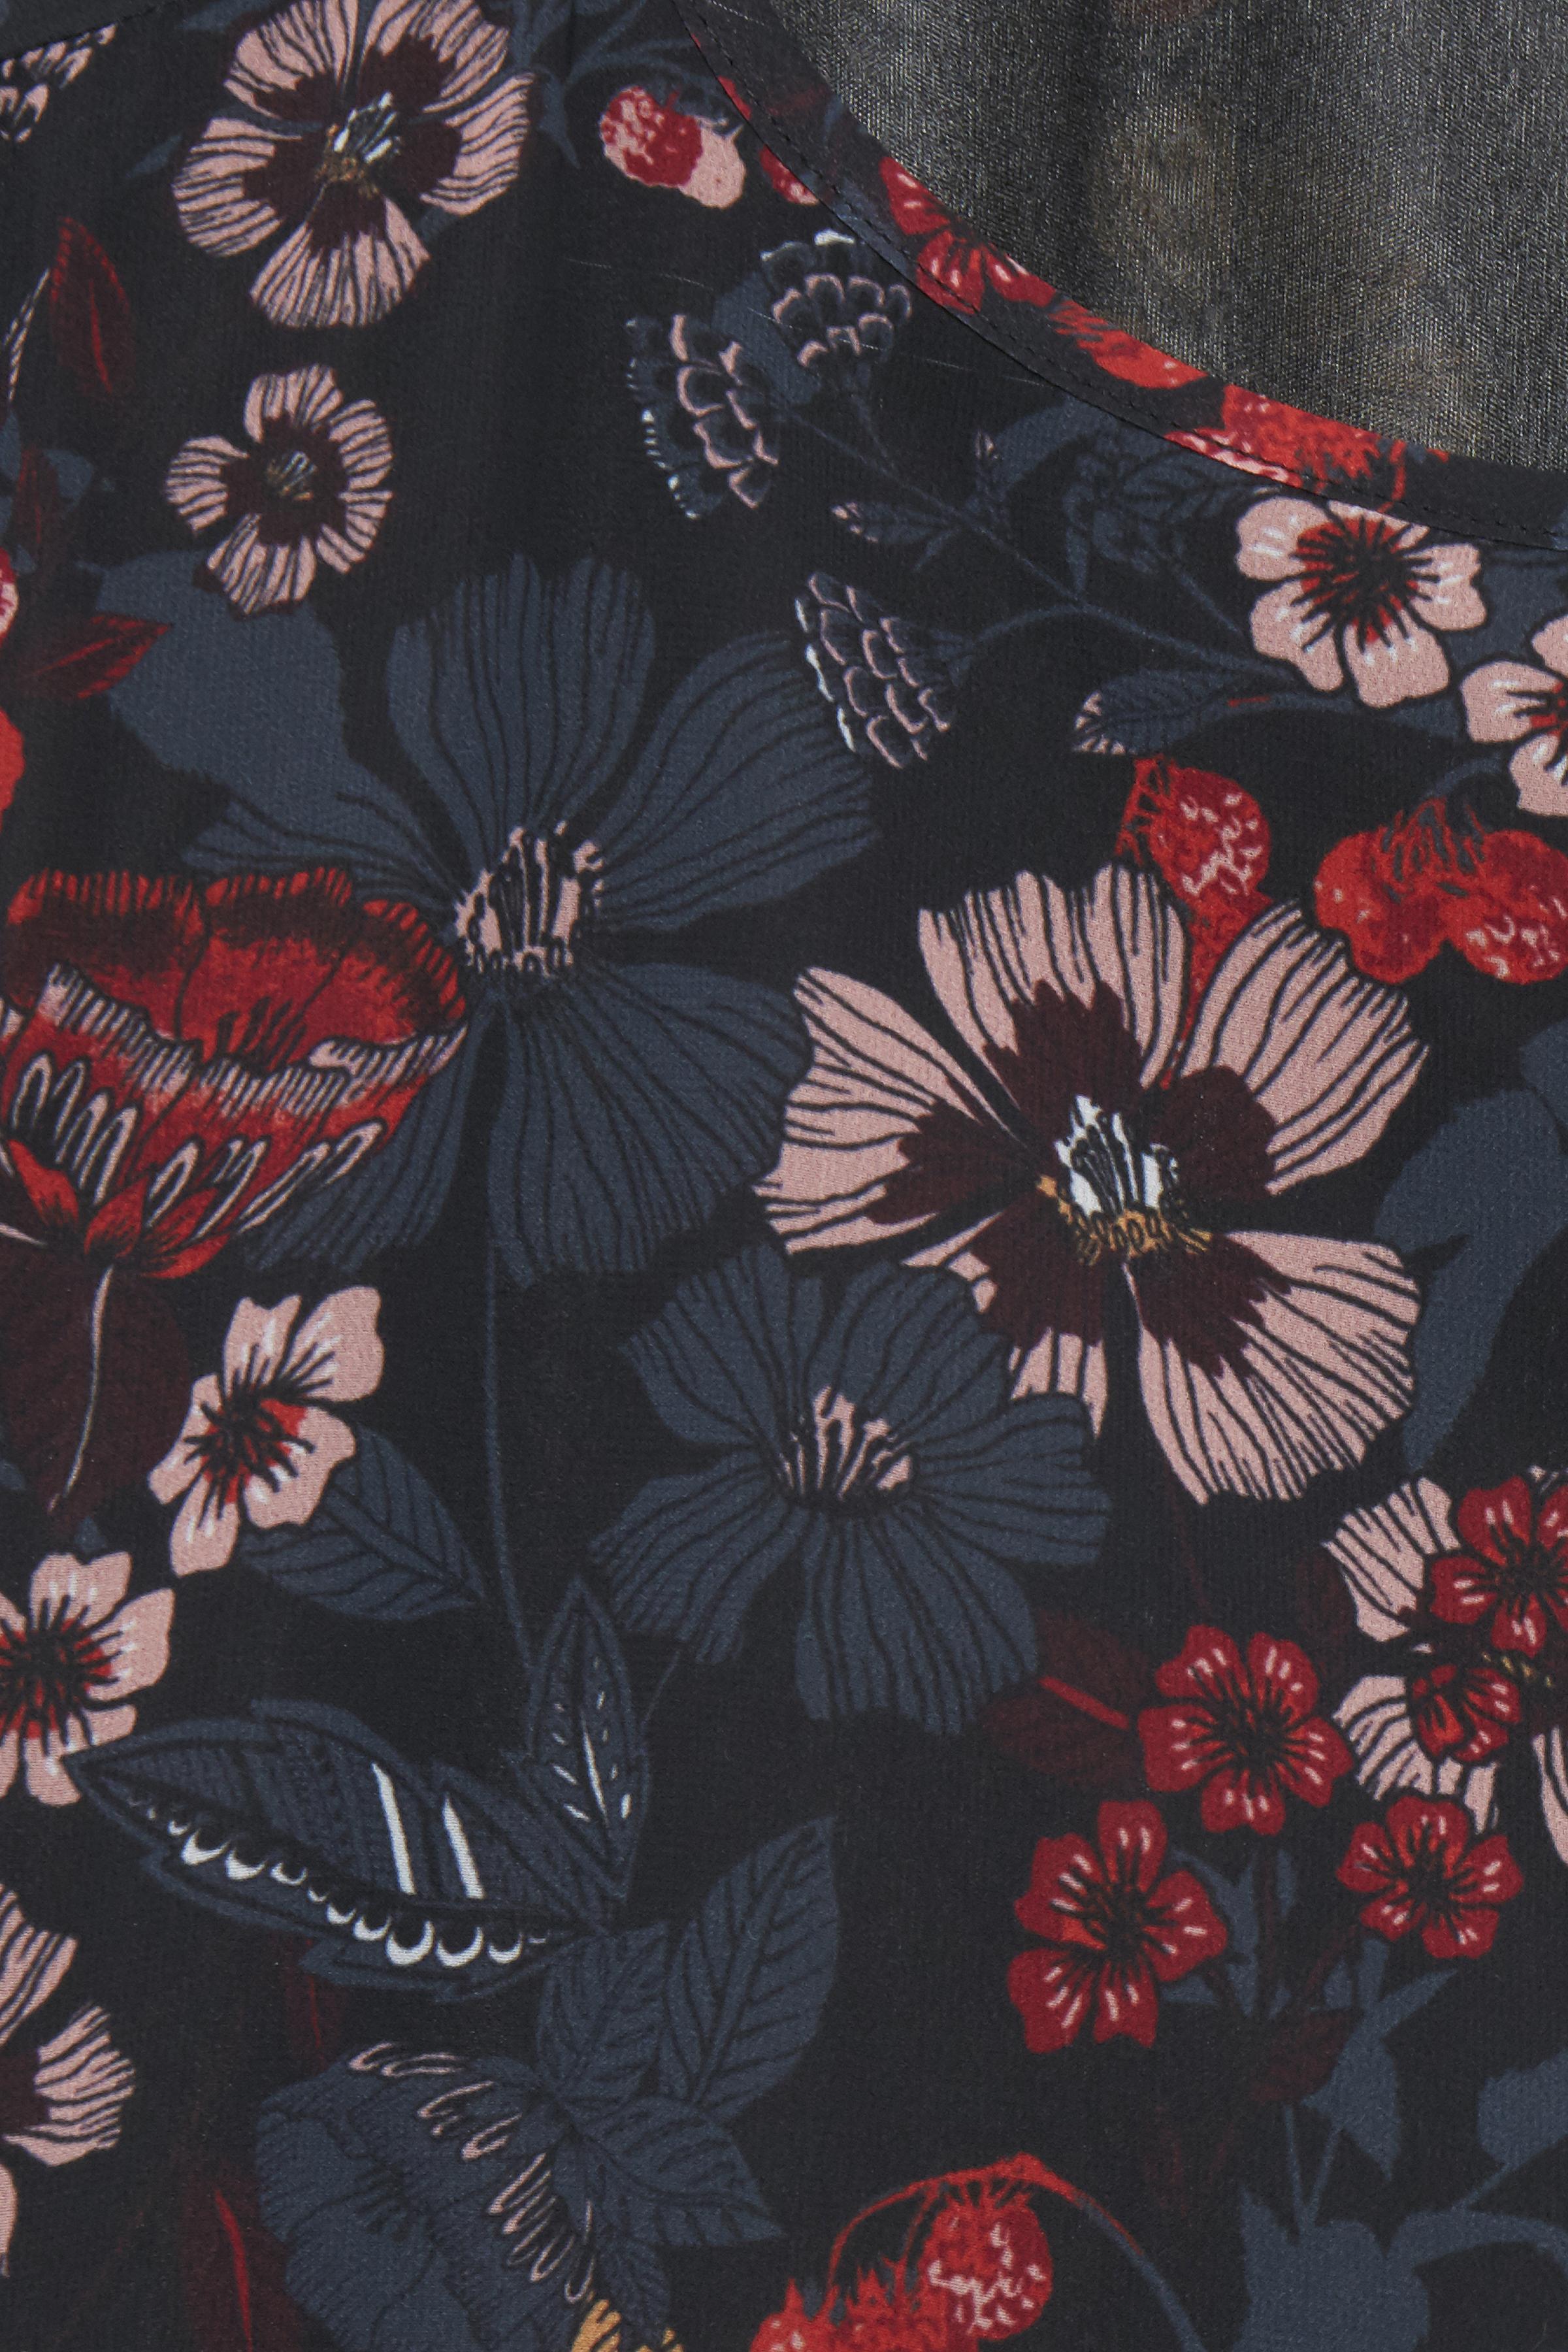 Black COMBI 1 print Långärmad blus från b.young – Köp Black COMBI 1 print Långärmad blus från storlek 36-46 här